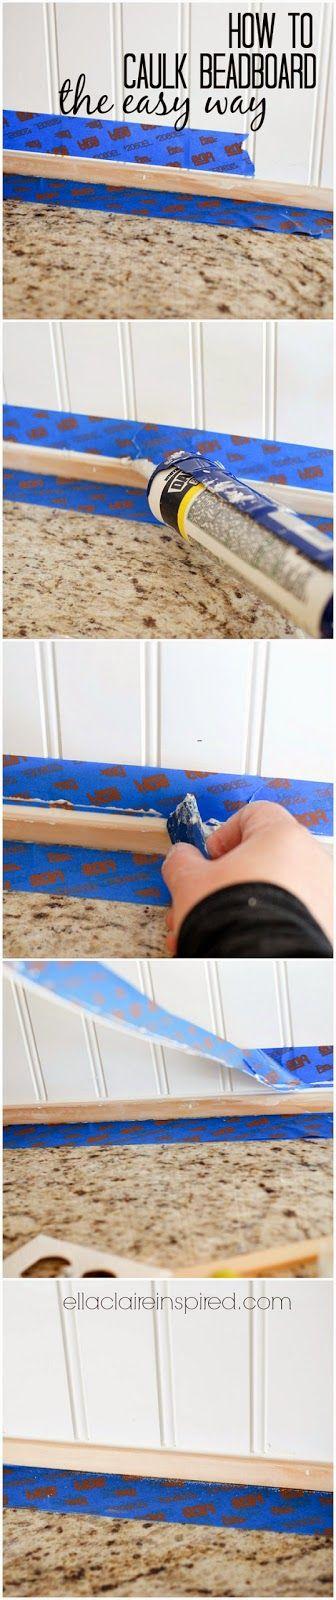 Remodeling Bathroom With Beadboard best 25+ bead board bathroom ideas only on pinterest | bead board